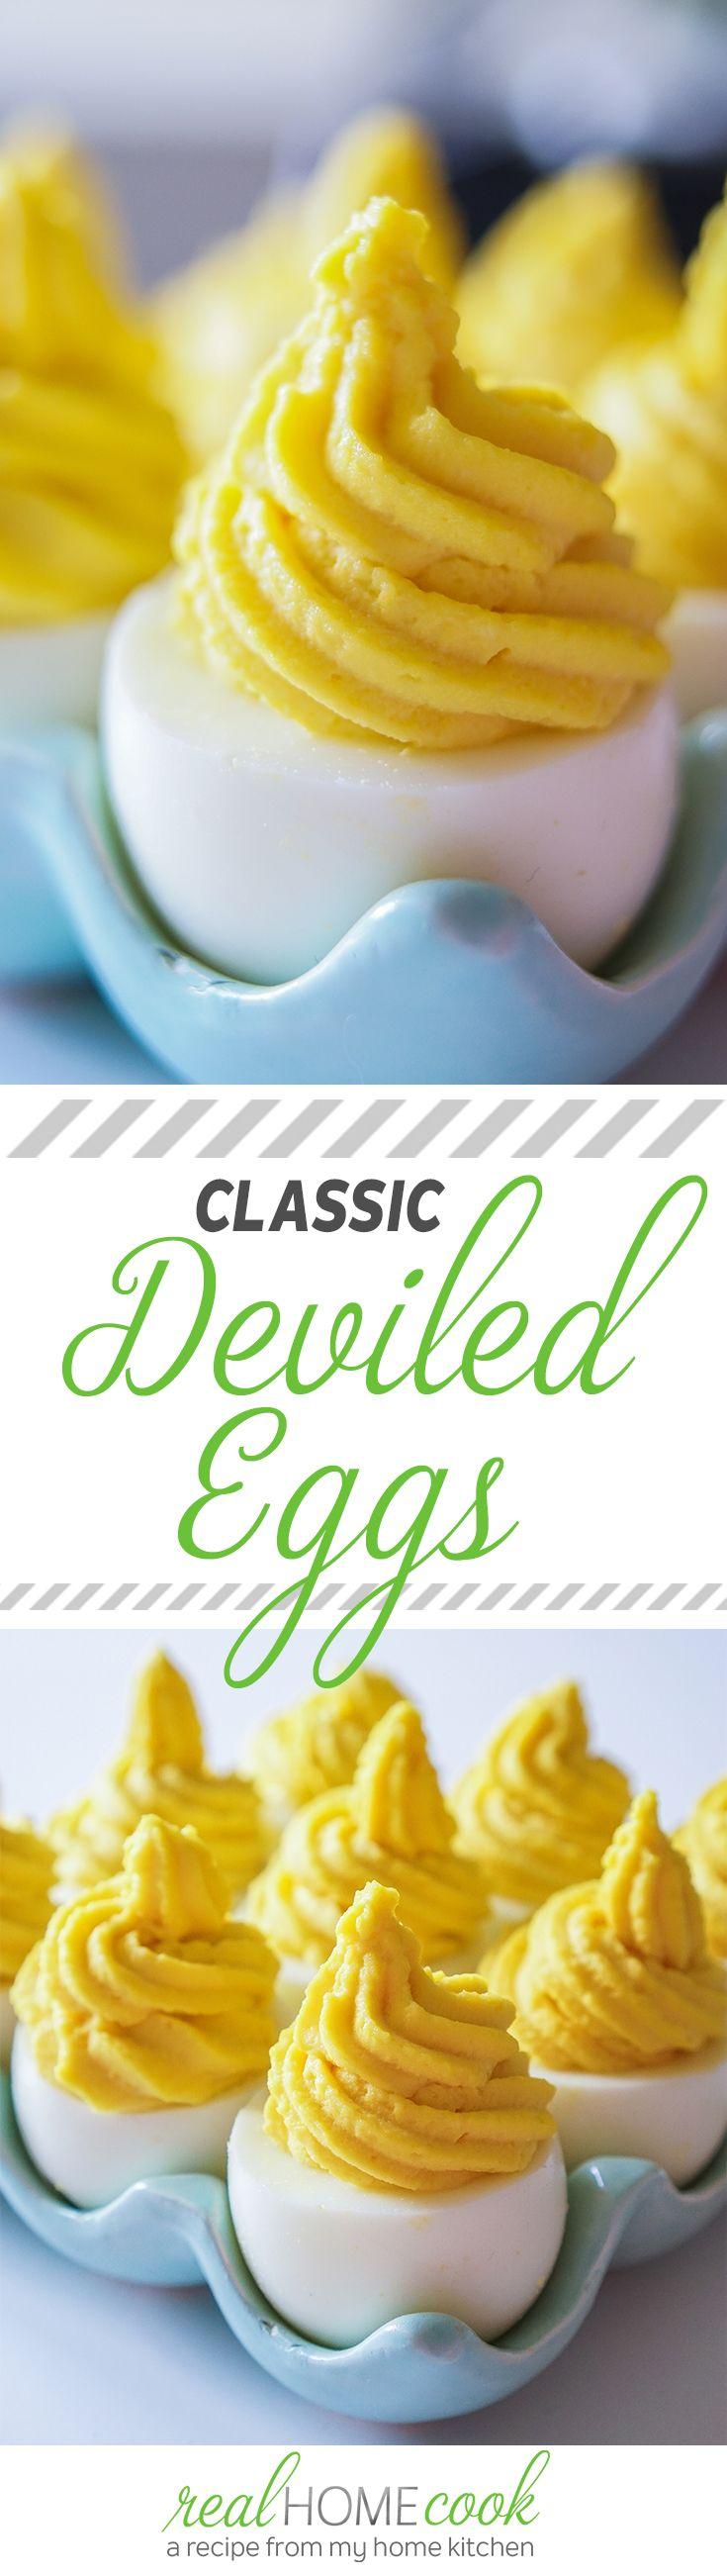 The perfect Classic Deviled Eggs | Appetizer Recipe